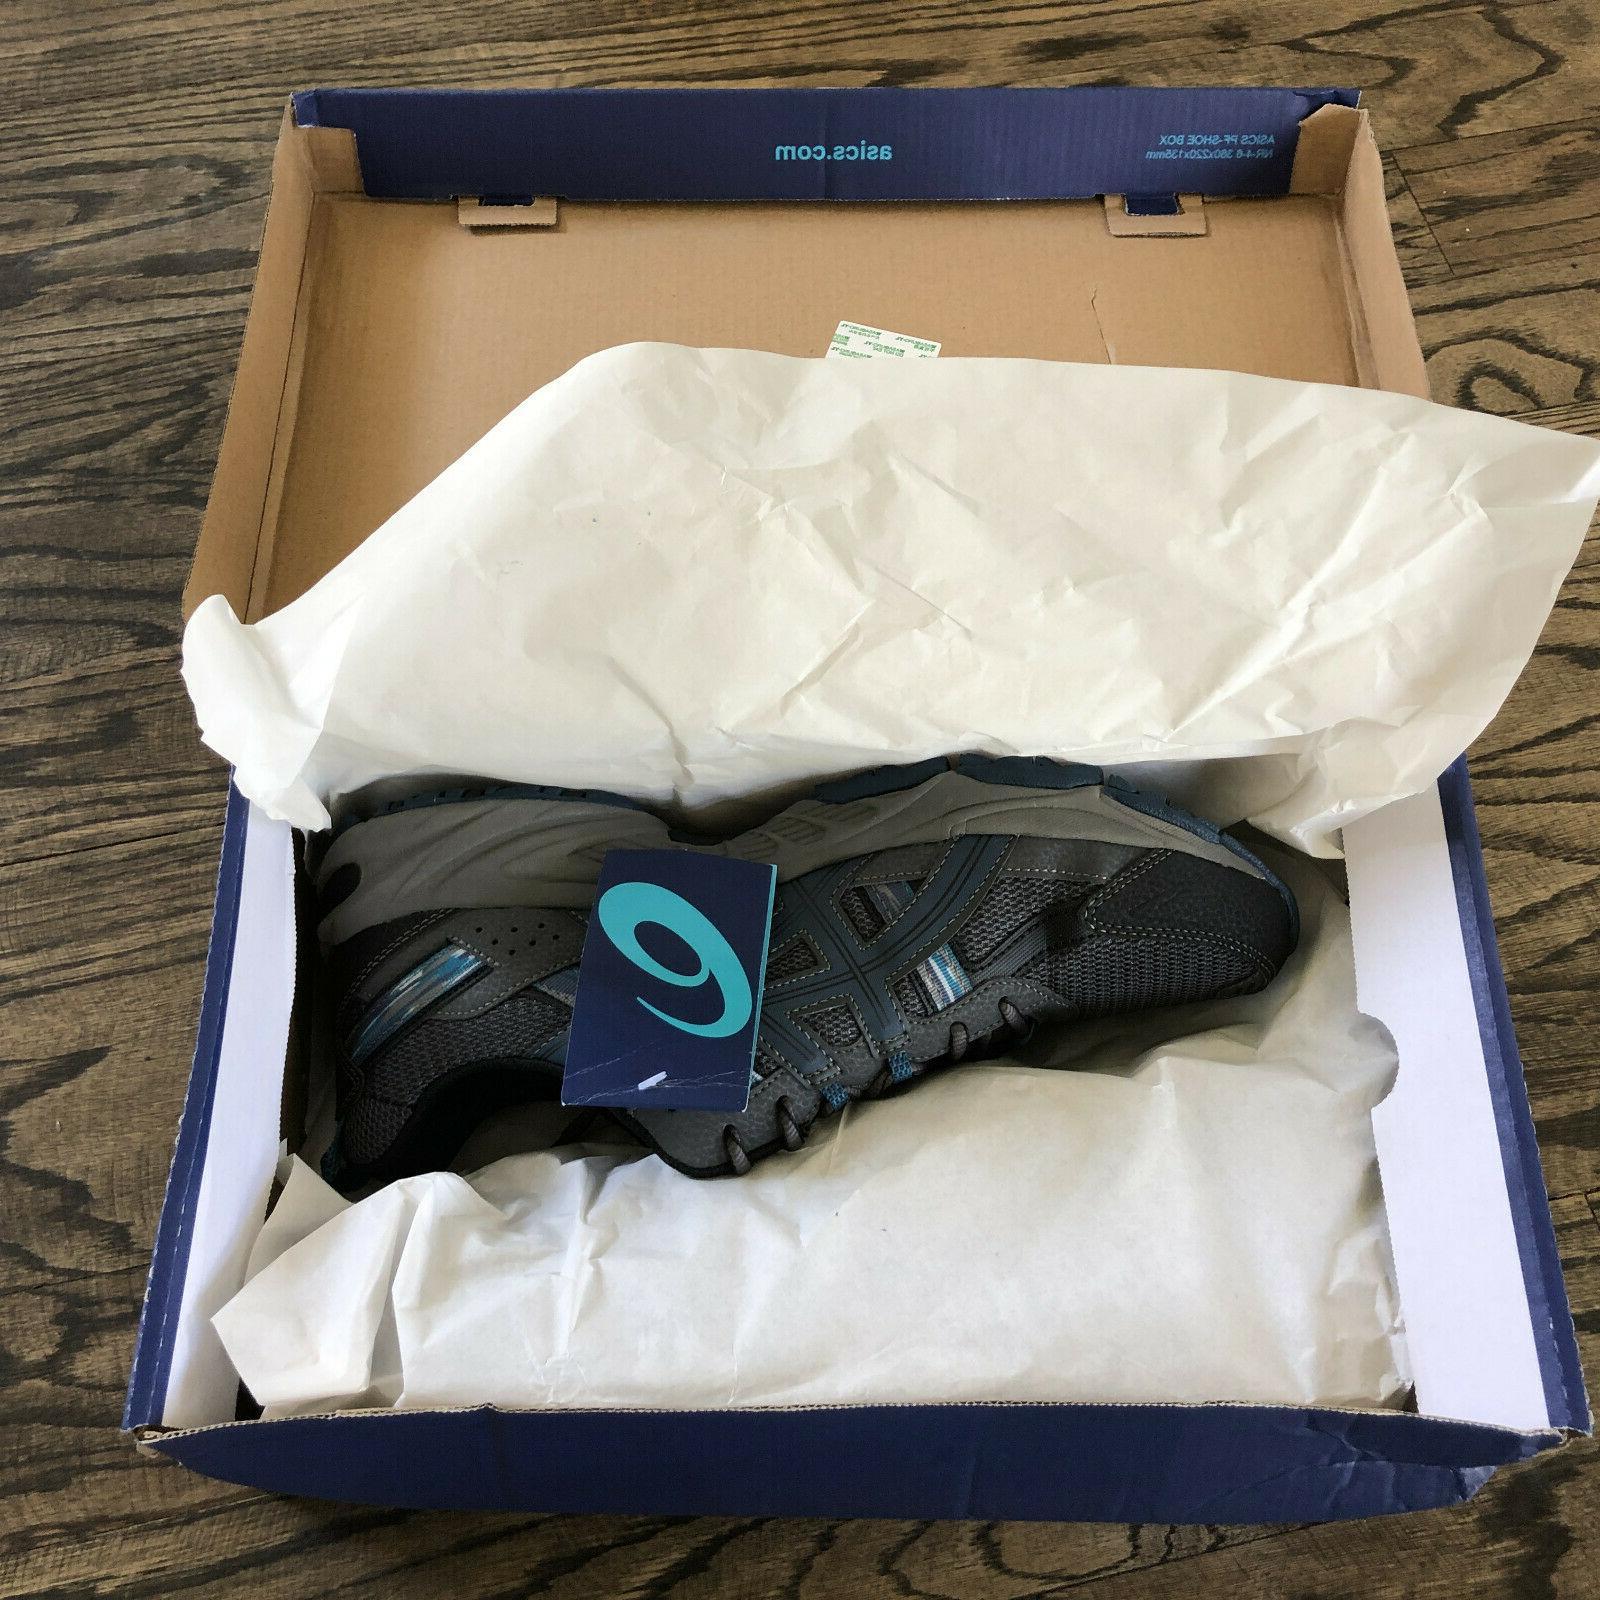 ASICS 5 Shoe Size 13 Box